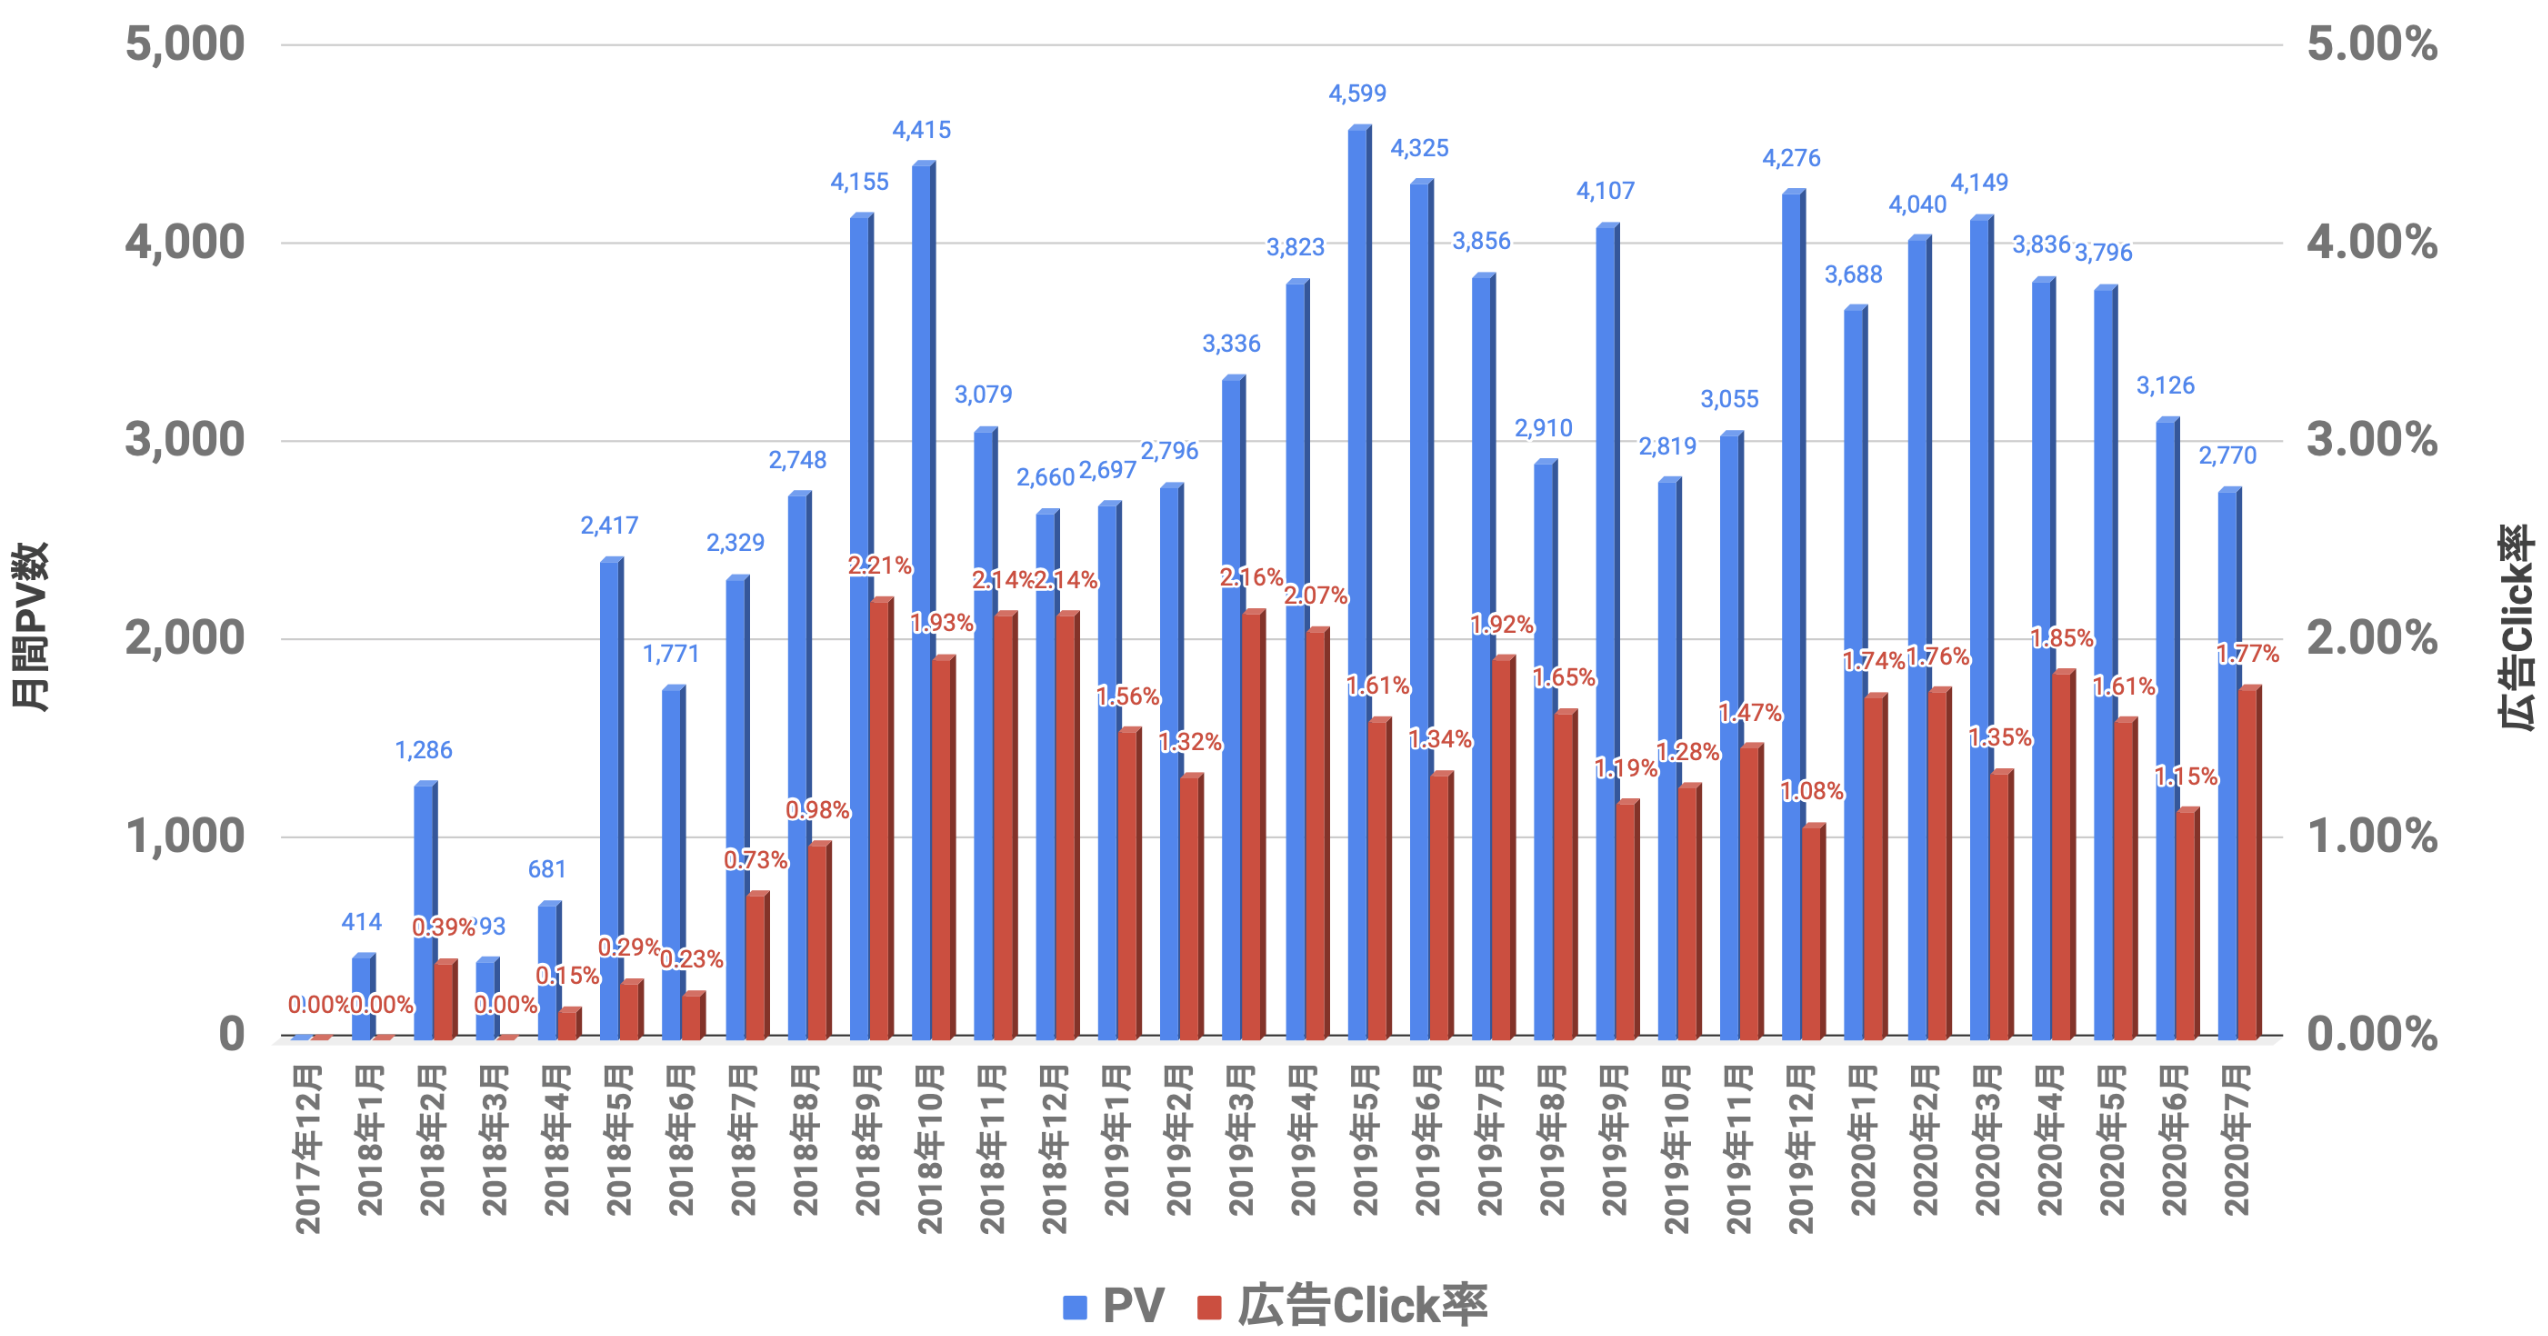 PVと広告Click率 2020年07月